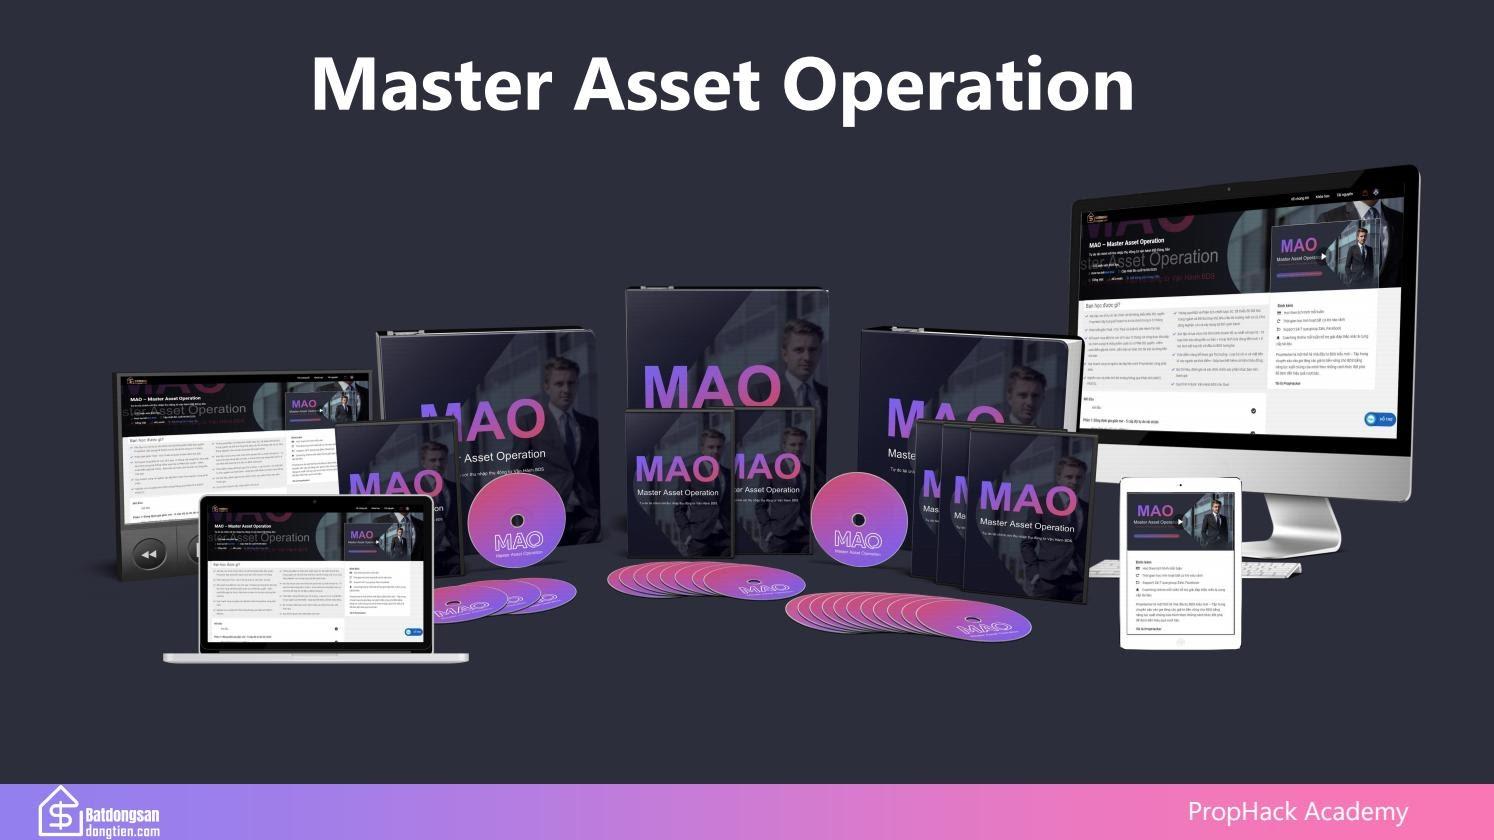 Share khóa học Coaching MAO – Master Asset Operation